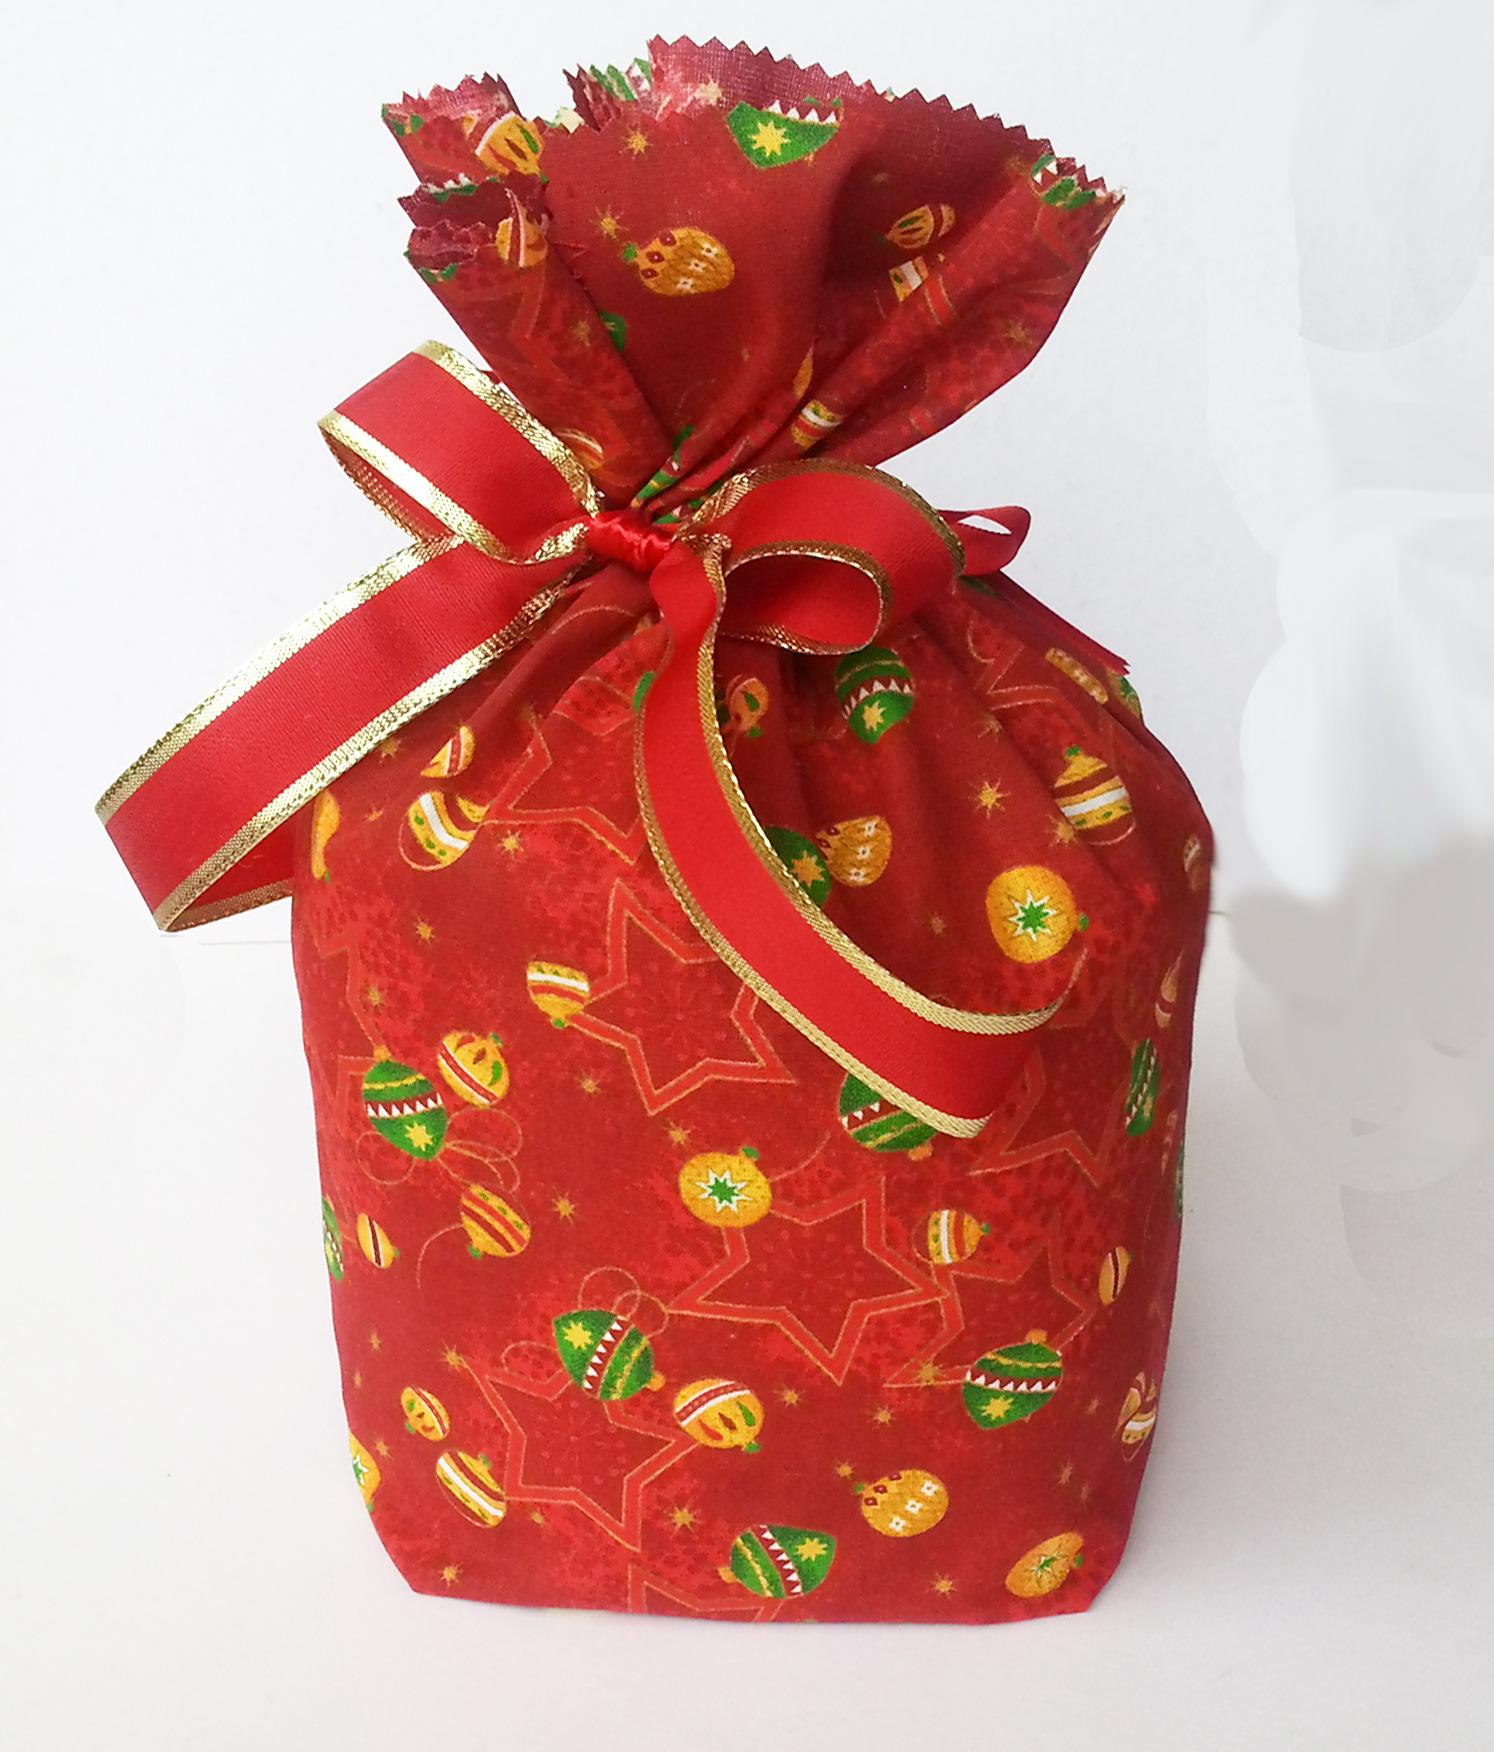 Presente Panetone Embalagem Presente Panetone Embalagem Presente